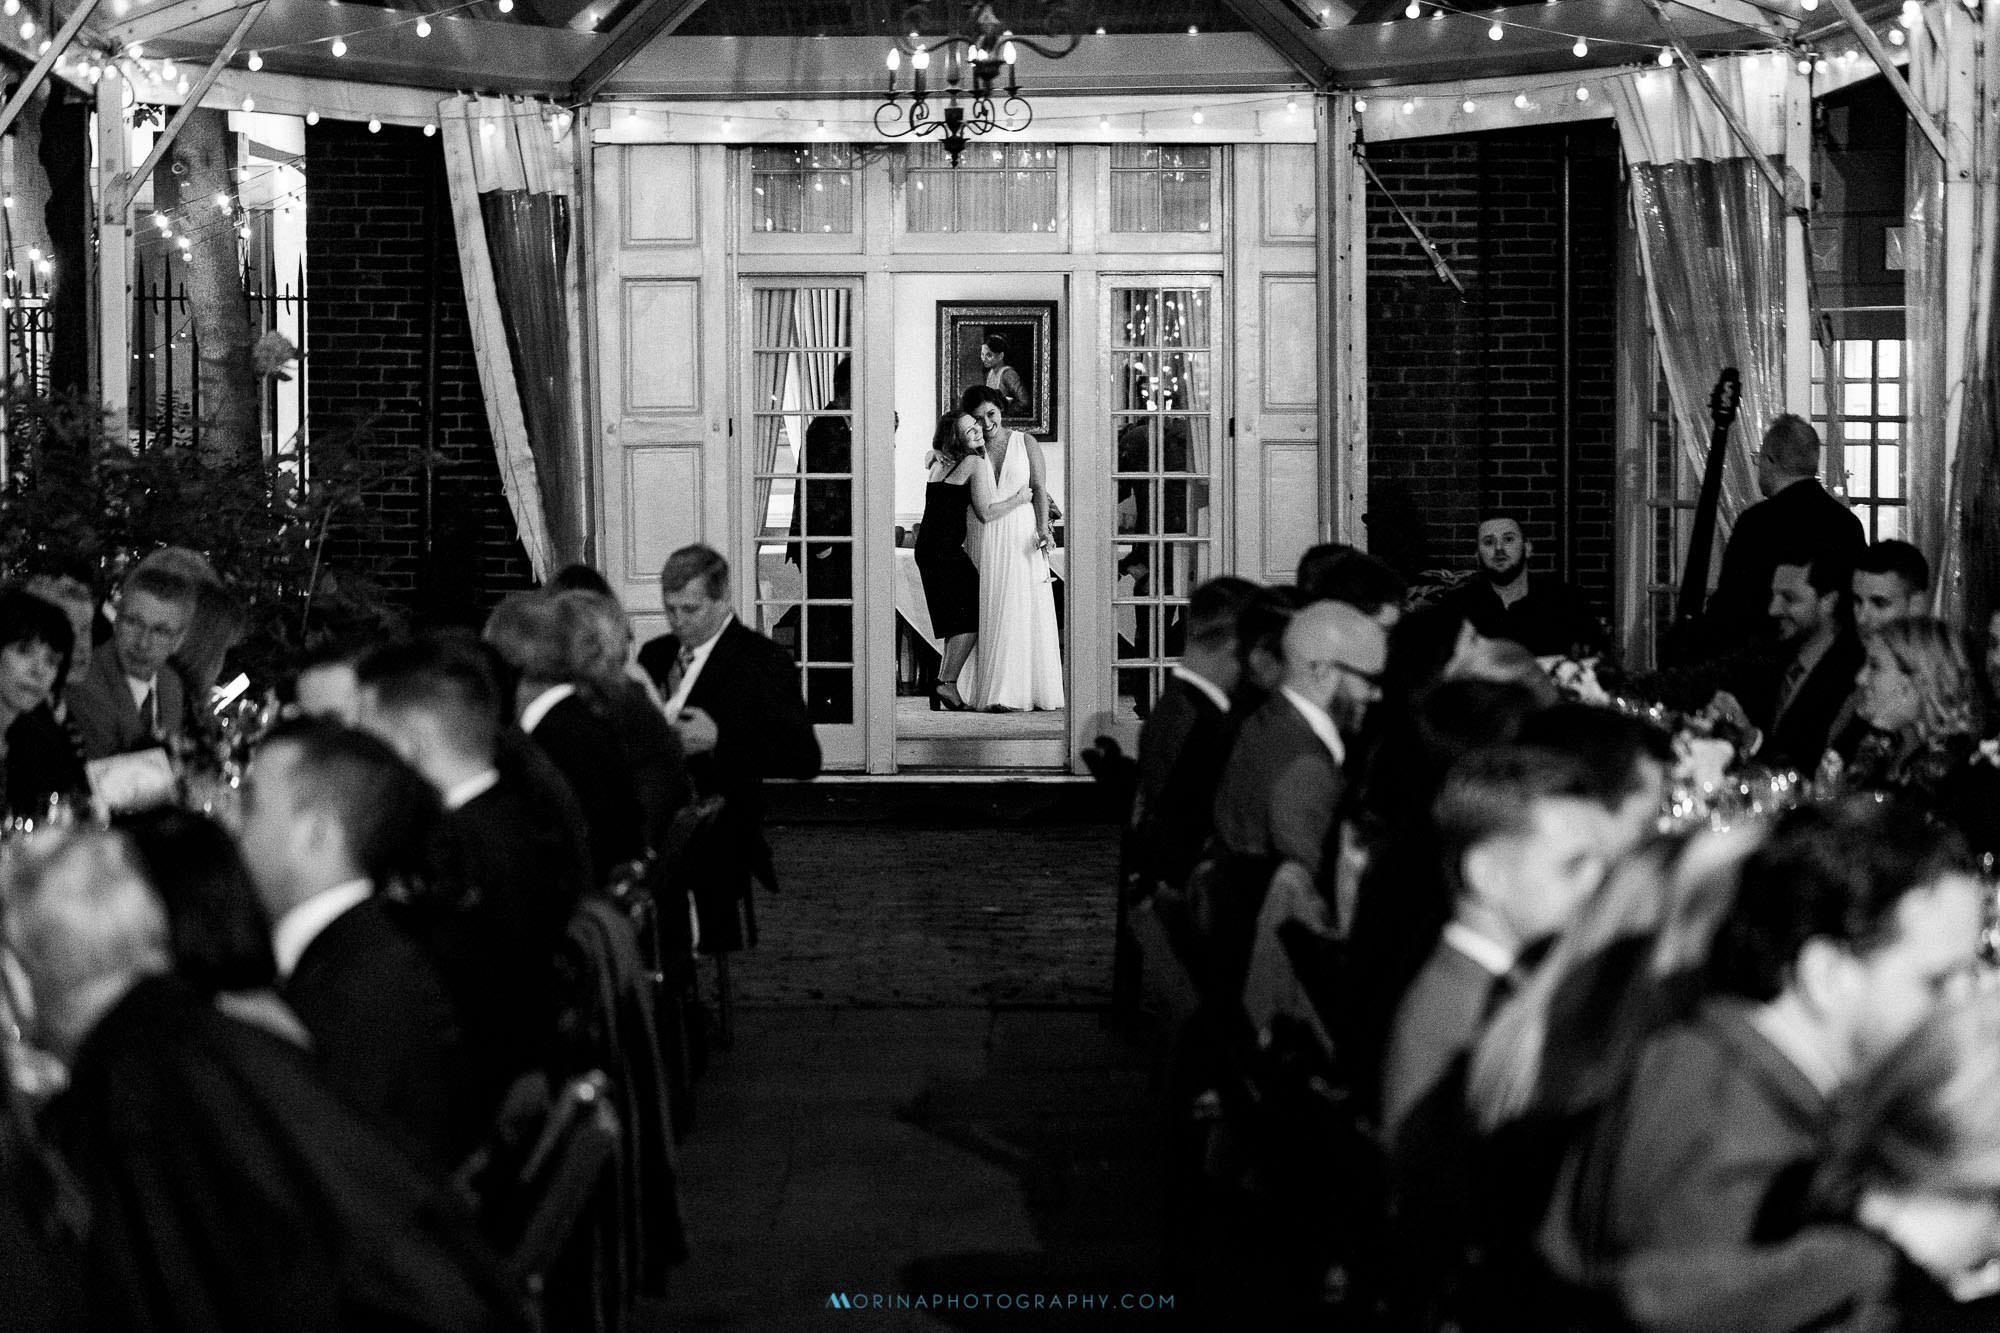 Yuki & Michael Wedding at Morris House Hotel Blog 0075.jpg